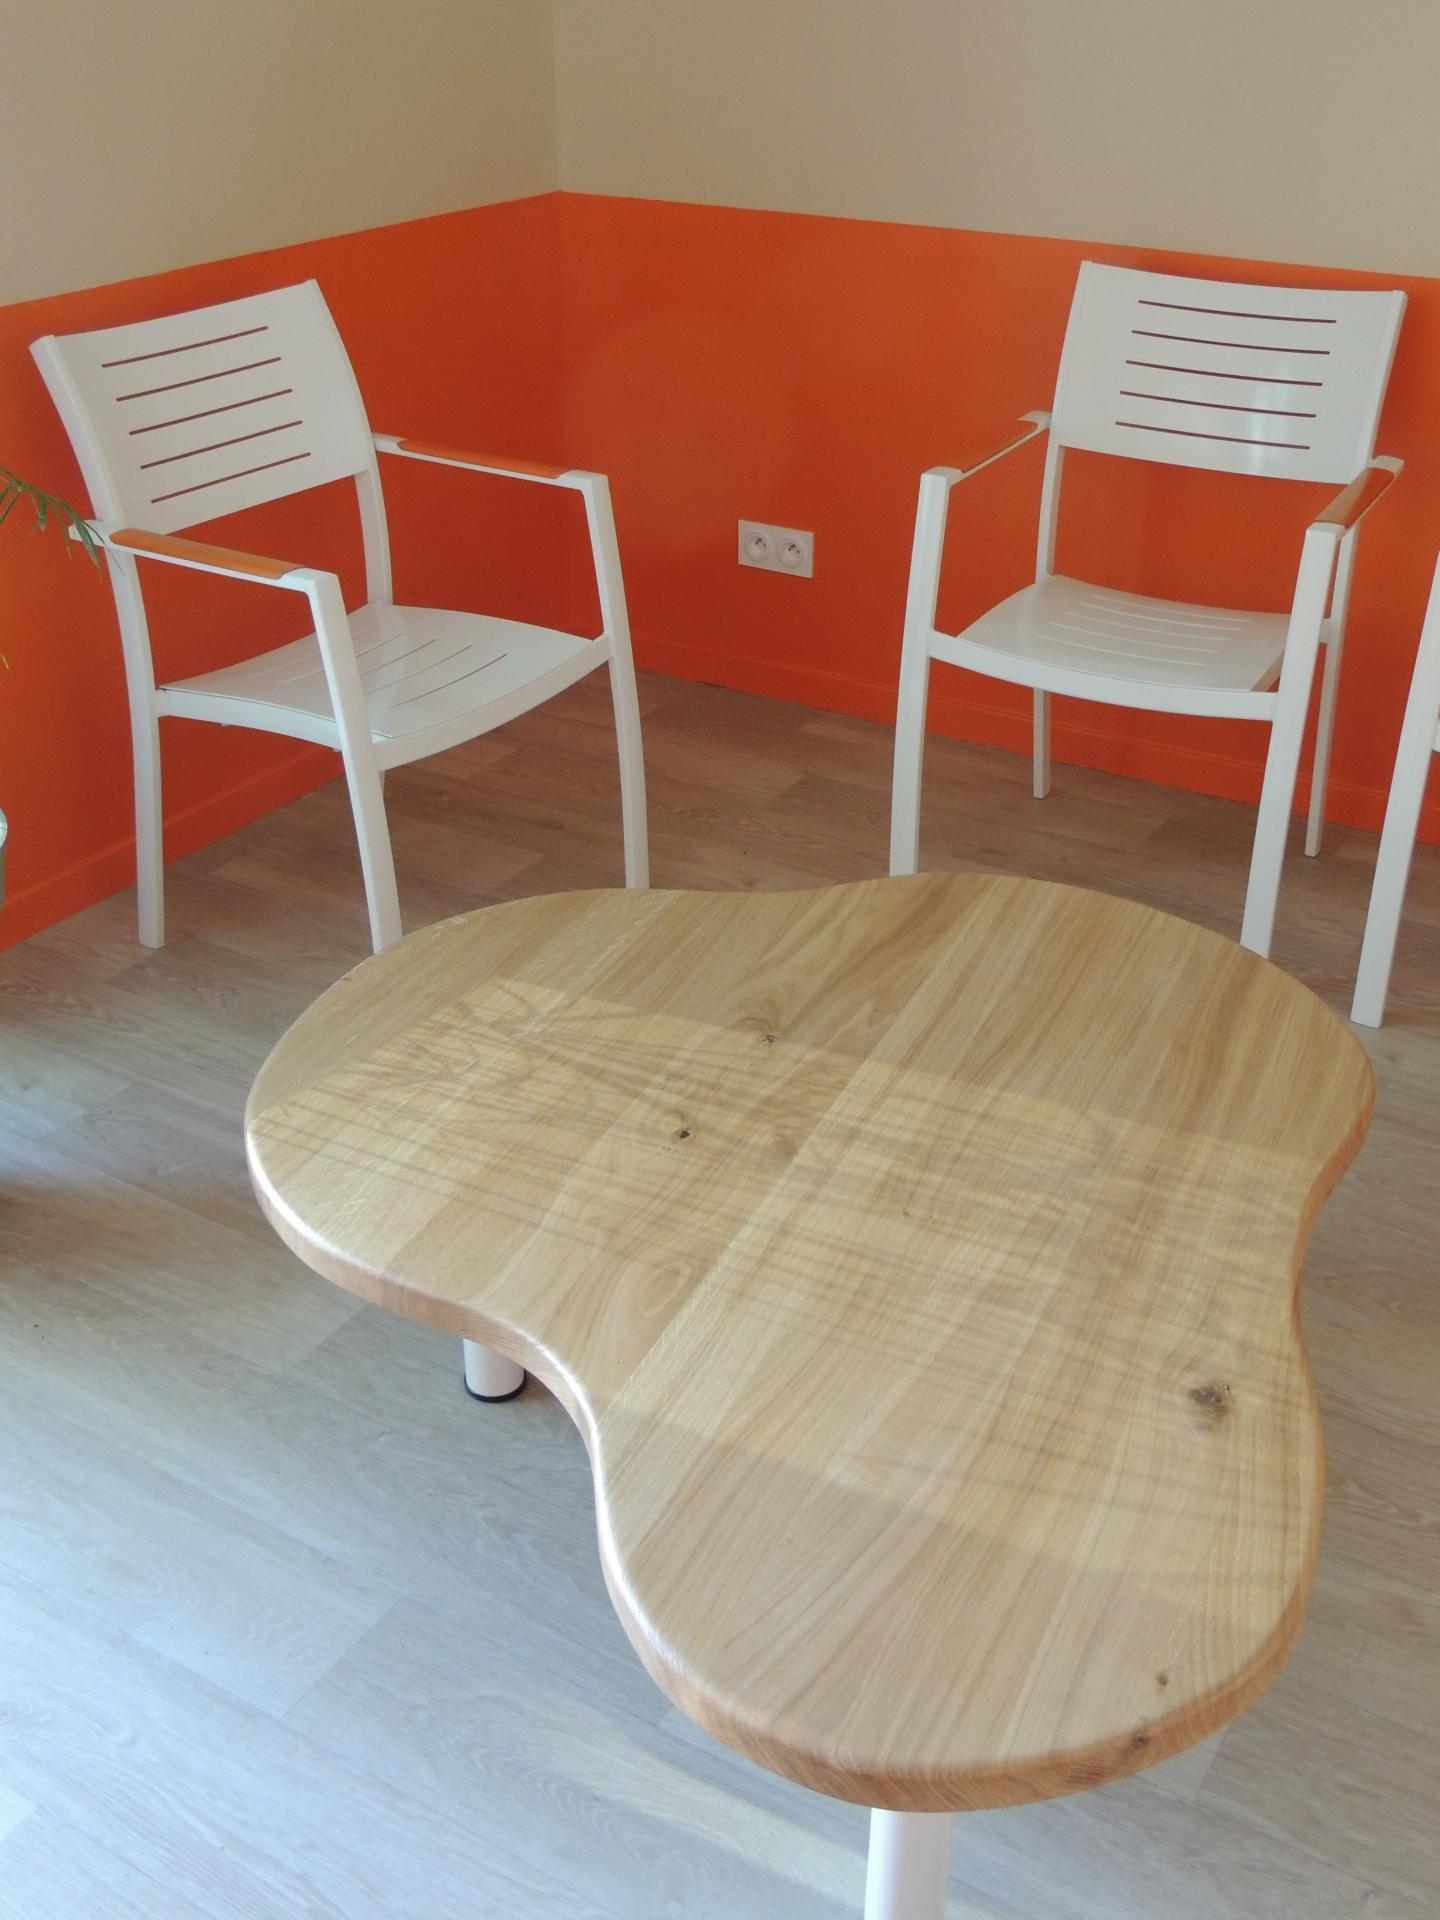 coffee table design - www.ateliercannelle.com